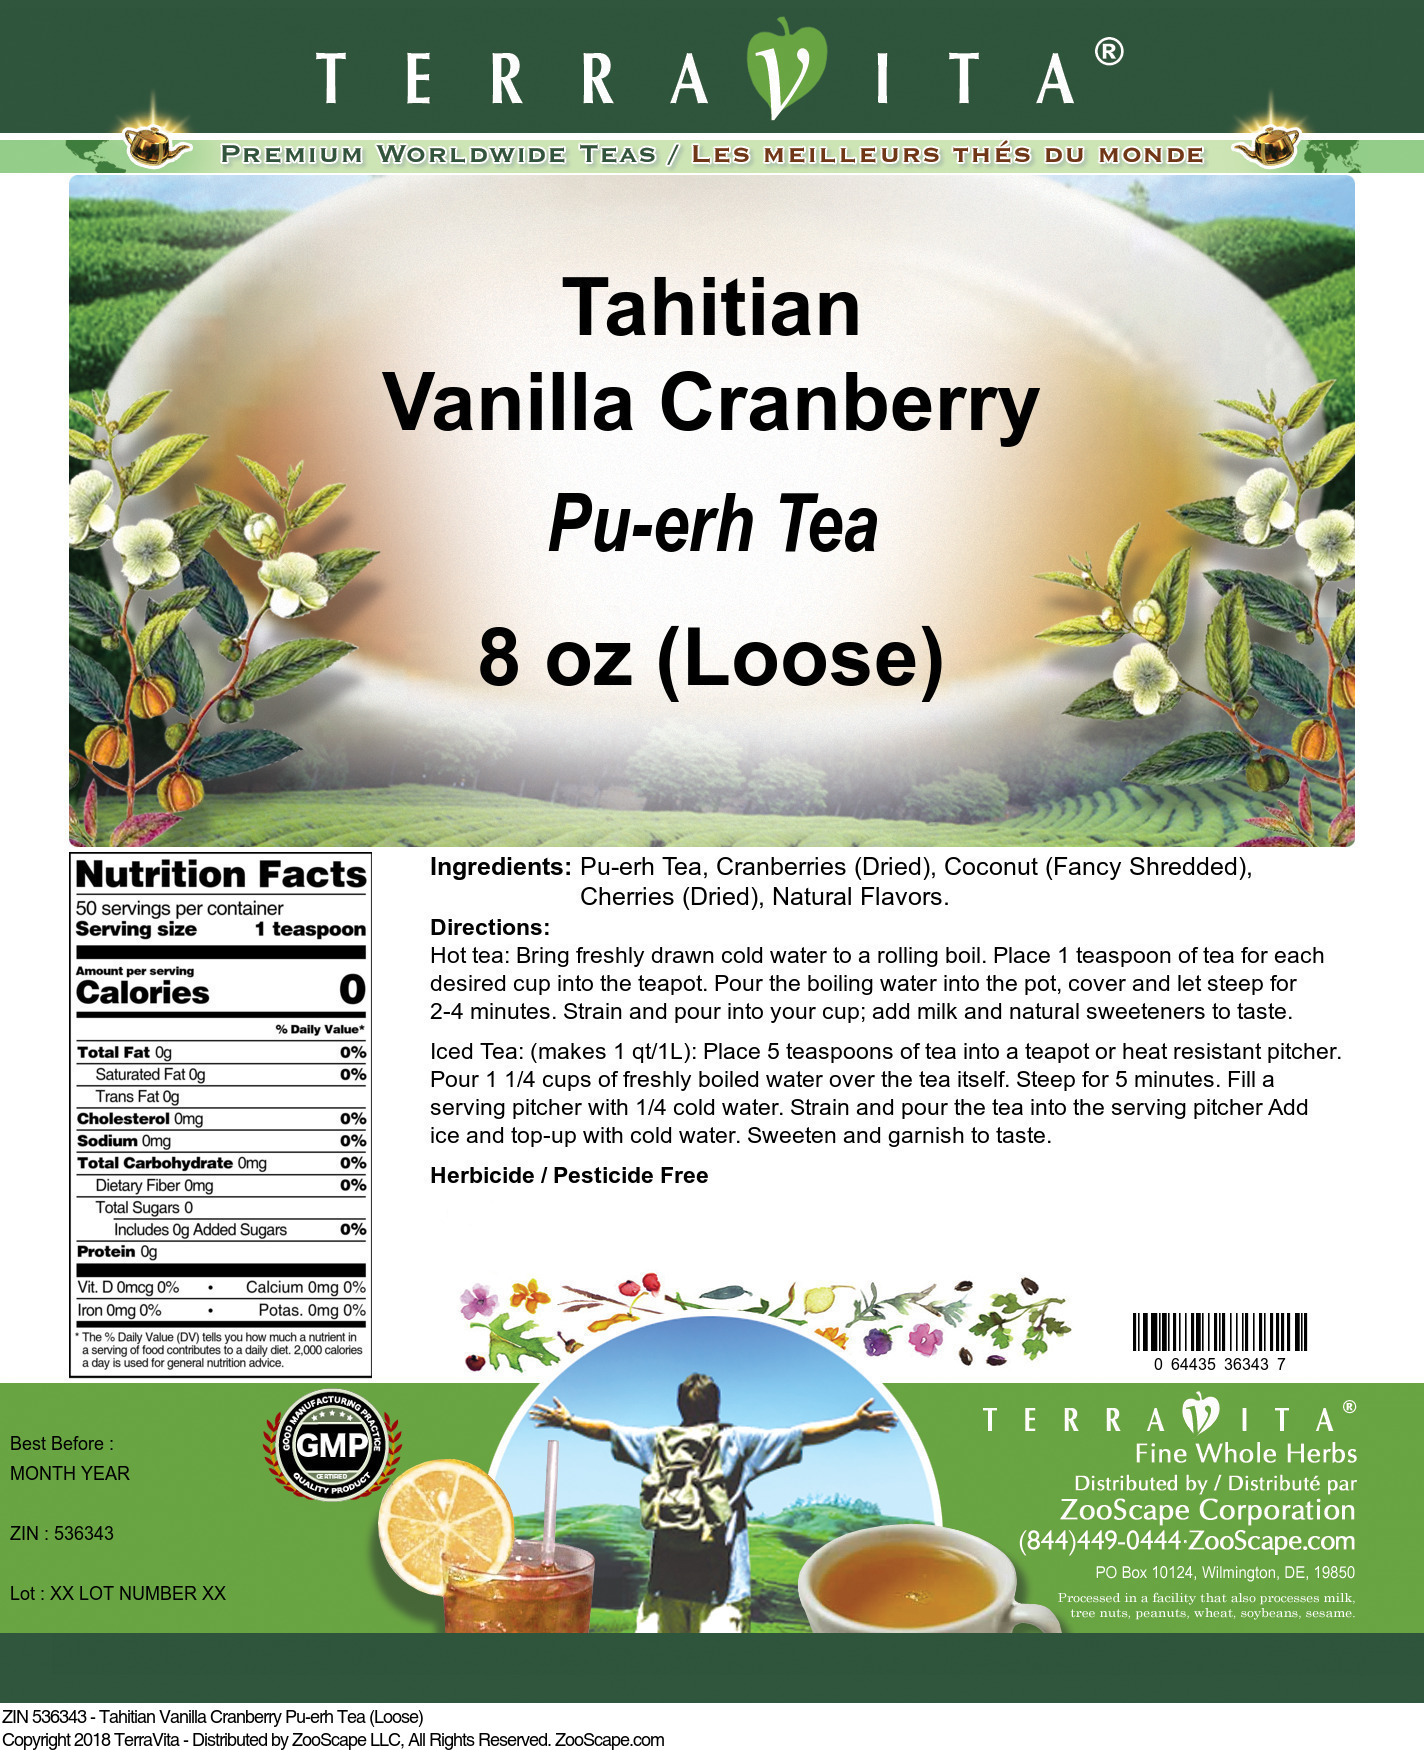 Tahitian Vanilla Cranberry Pu-erh Tea